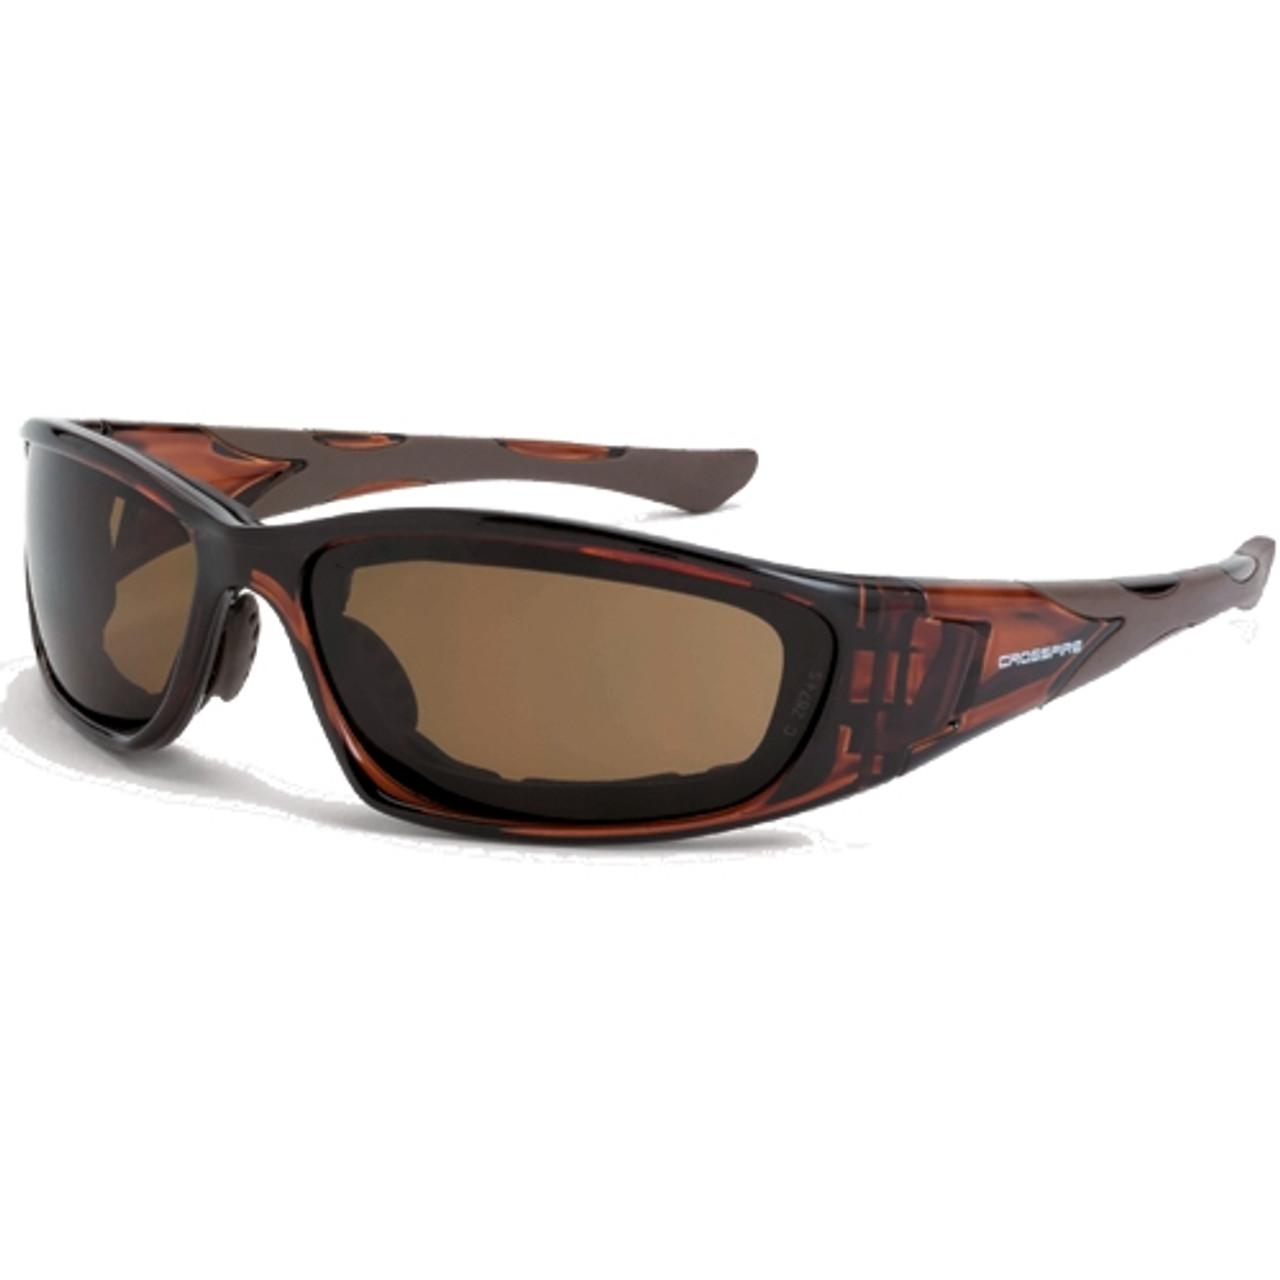 Crossfire 20291 M6A Smoke Lens and Crystal Black Frame